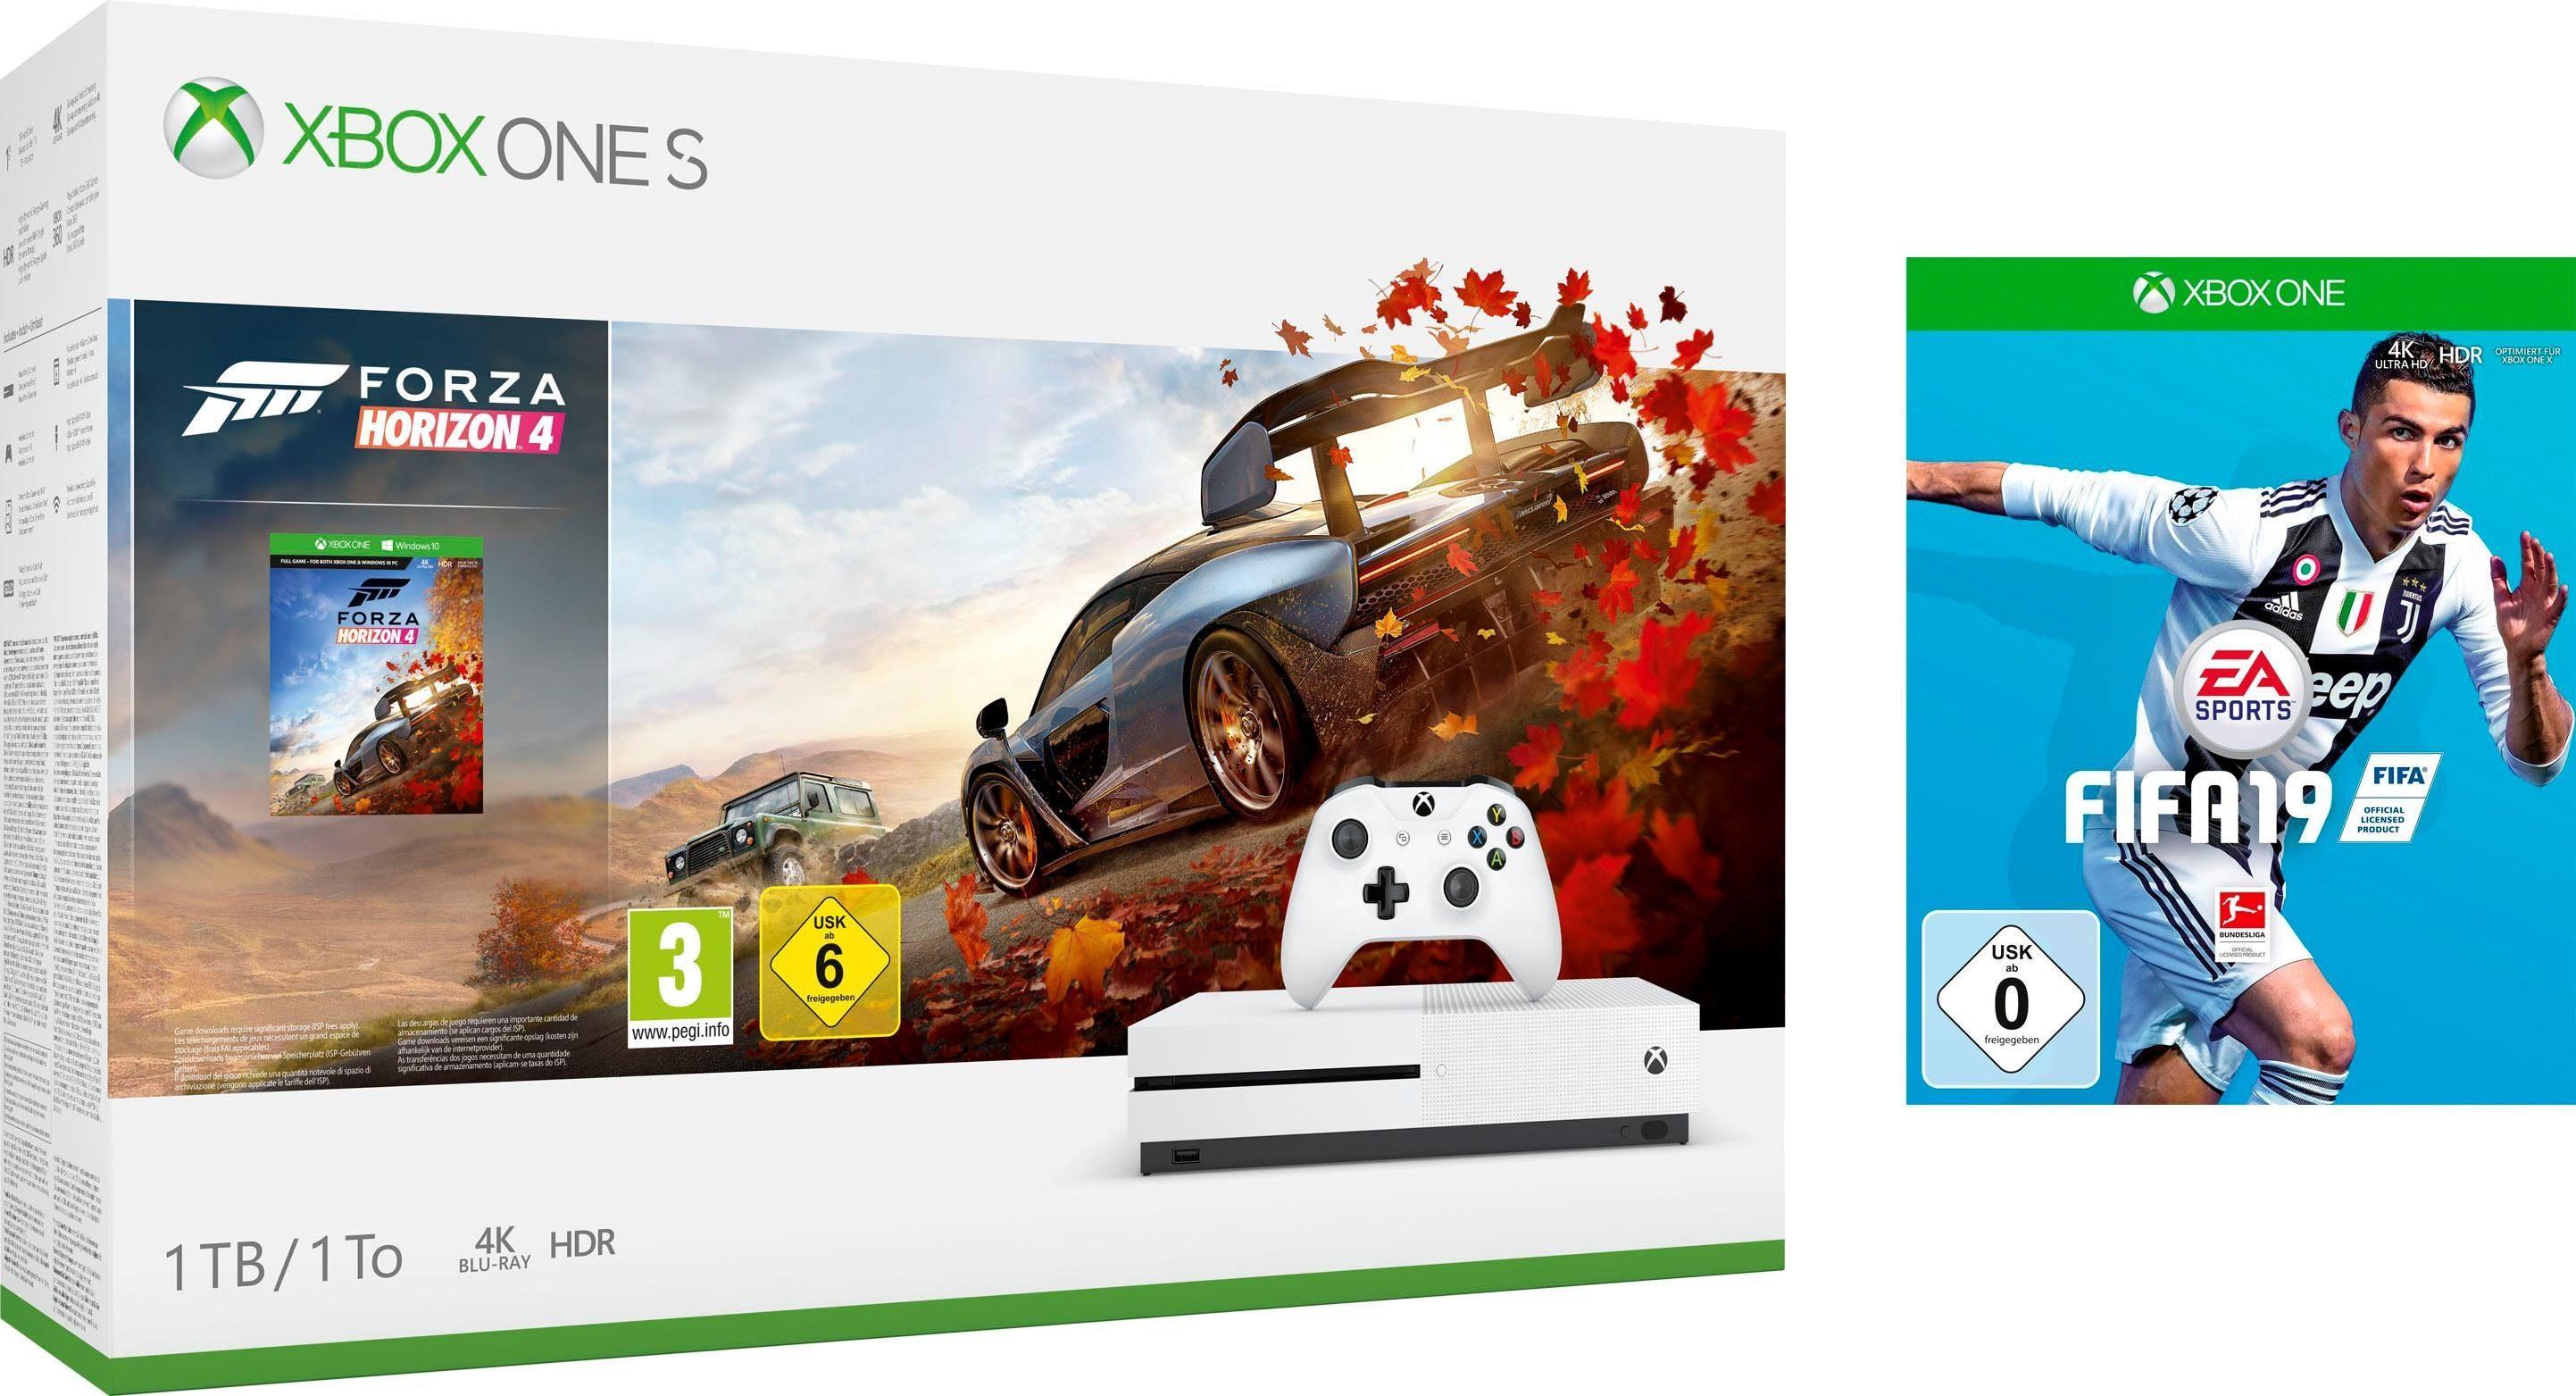 Xbox One S 1TB (Bundle, inkl. Forza Horizon 4 + FIFA 19)